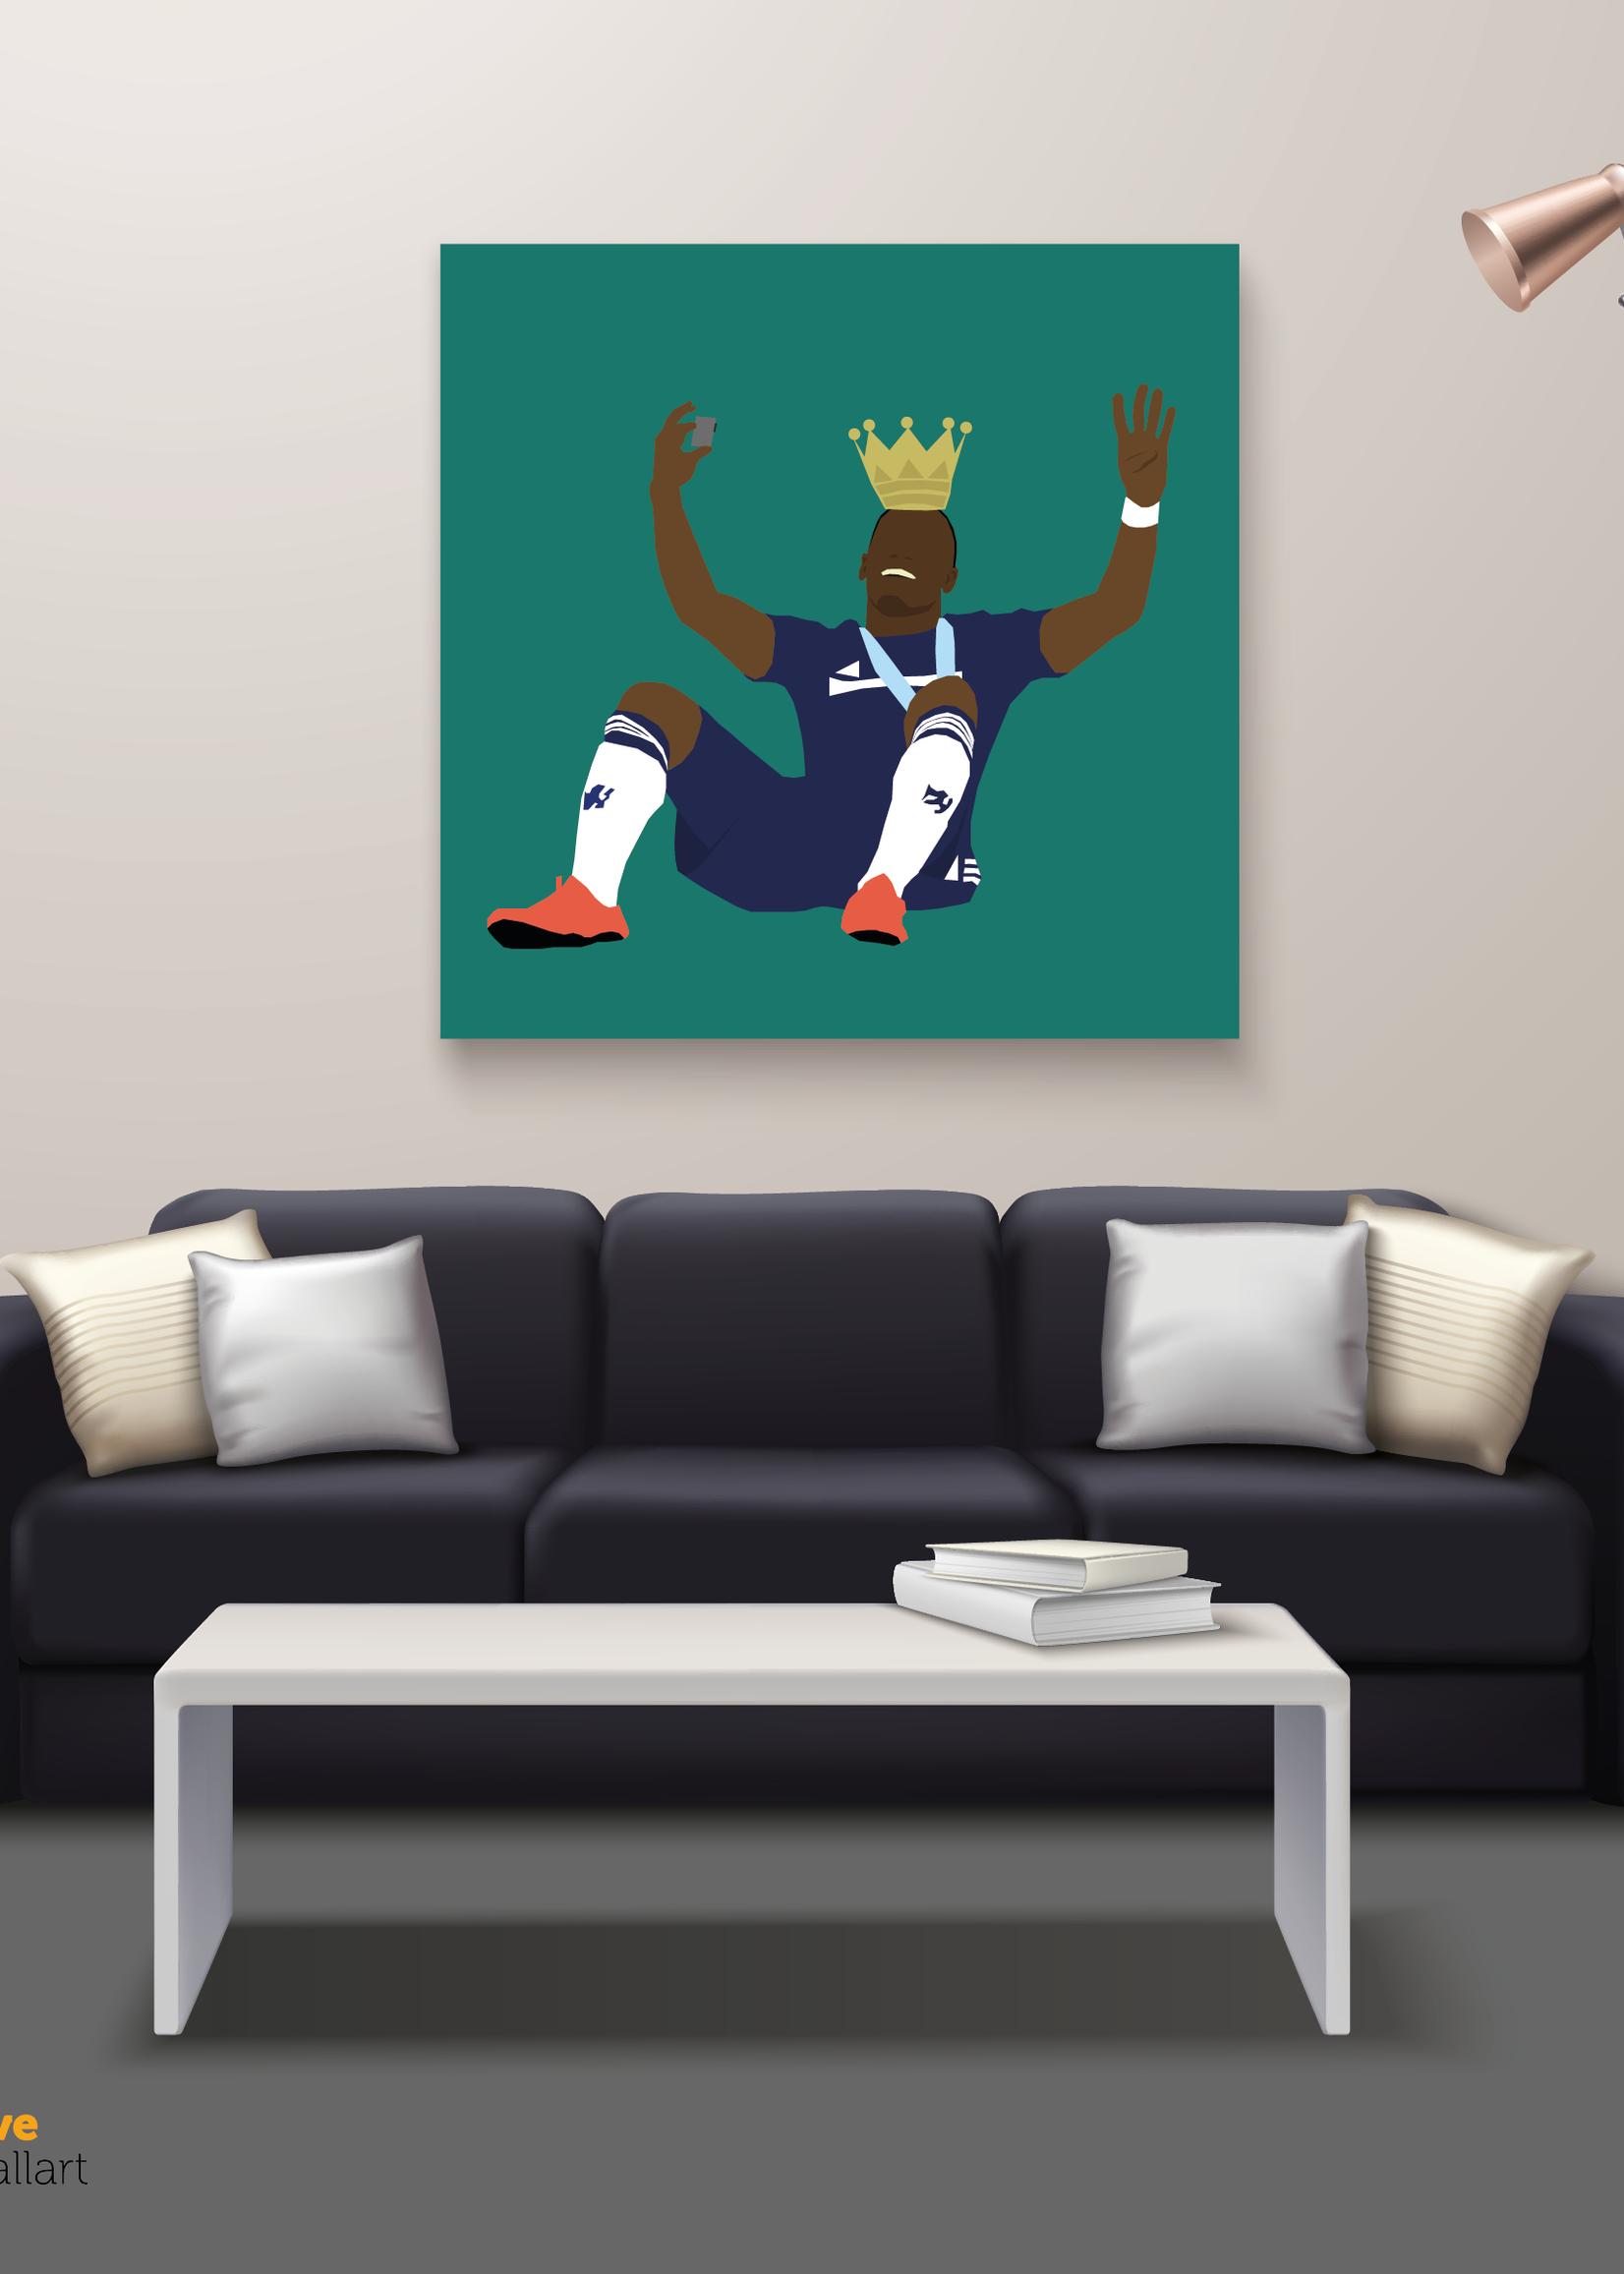 "We Love Football Art ""Tito"" We Love Football Art"